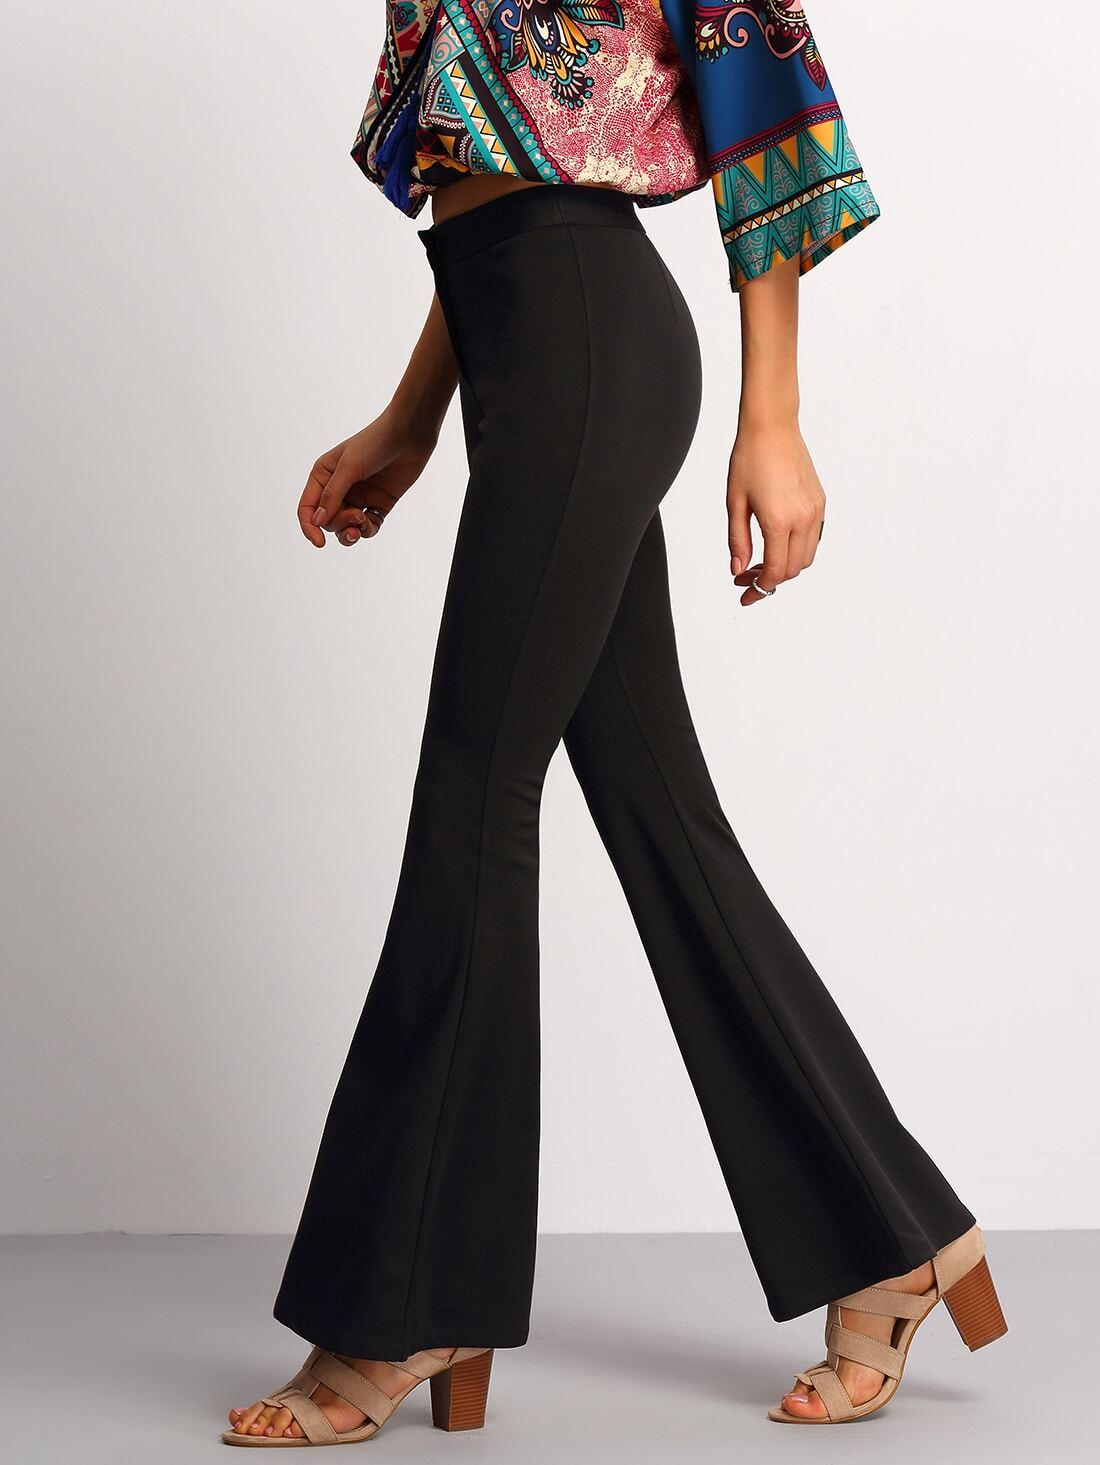 pantalon patte d 39 l phant taille lastique noir french shein sheinside. Black Bedroom Furniture Sets. Home Design Ideas